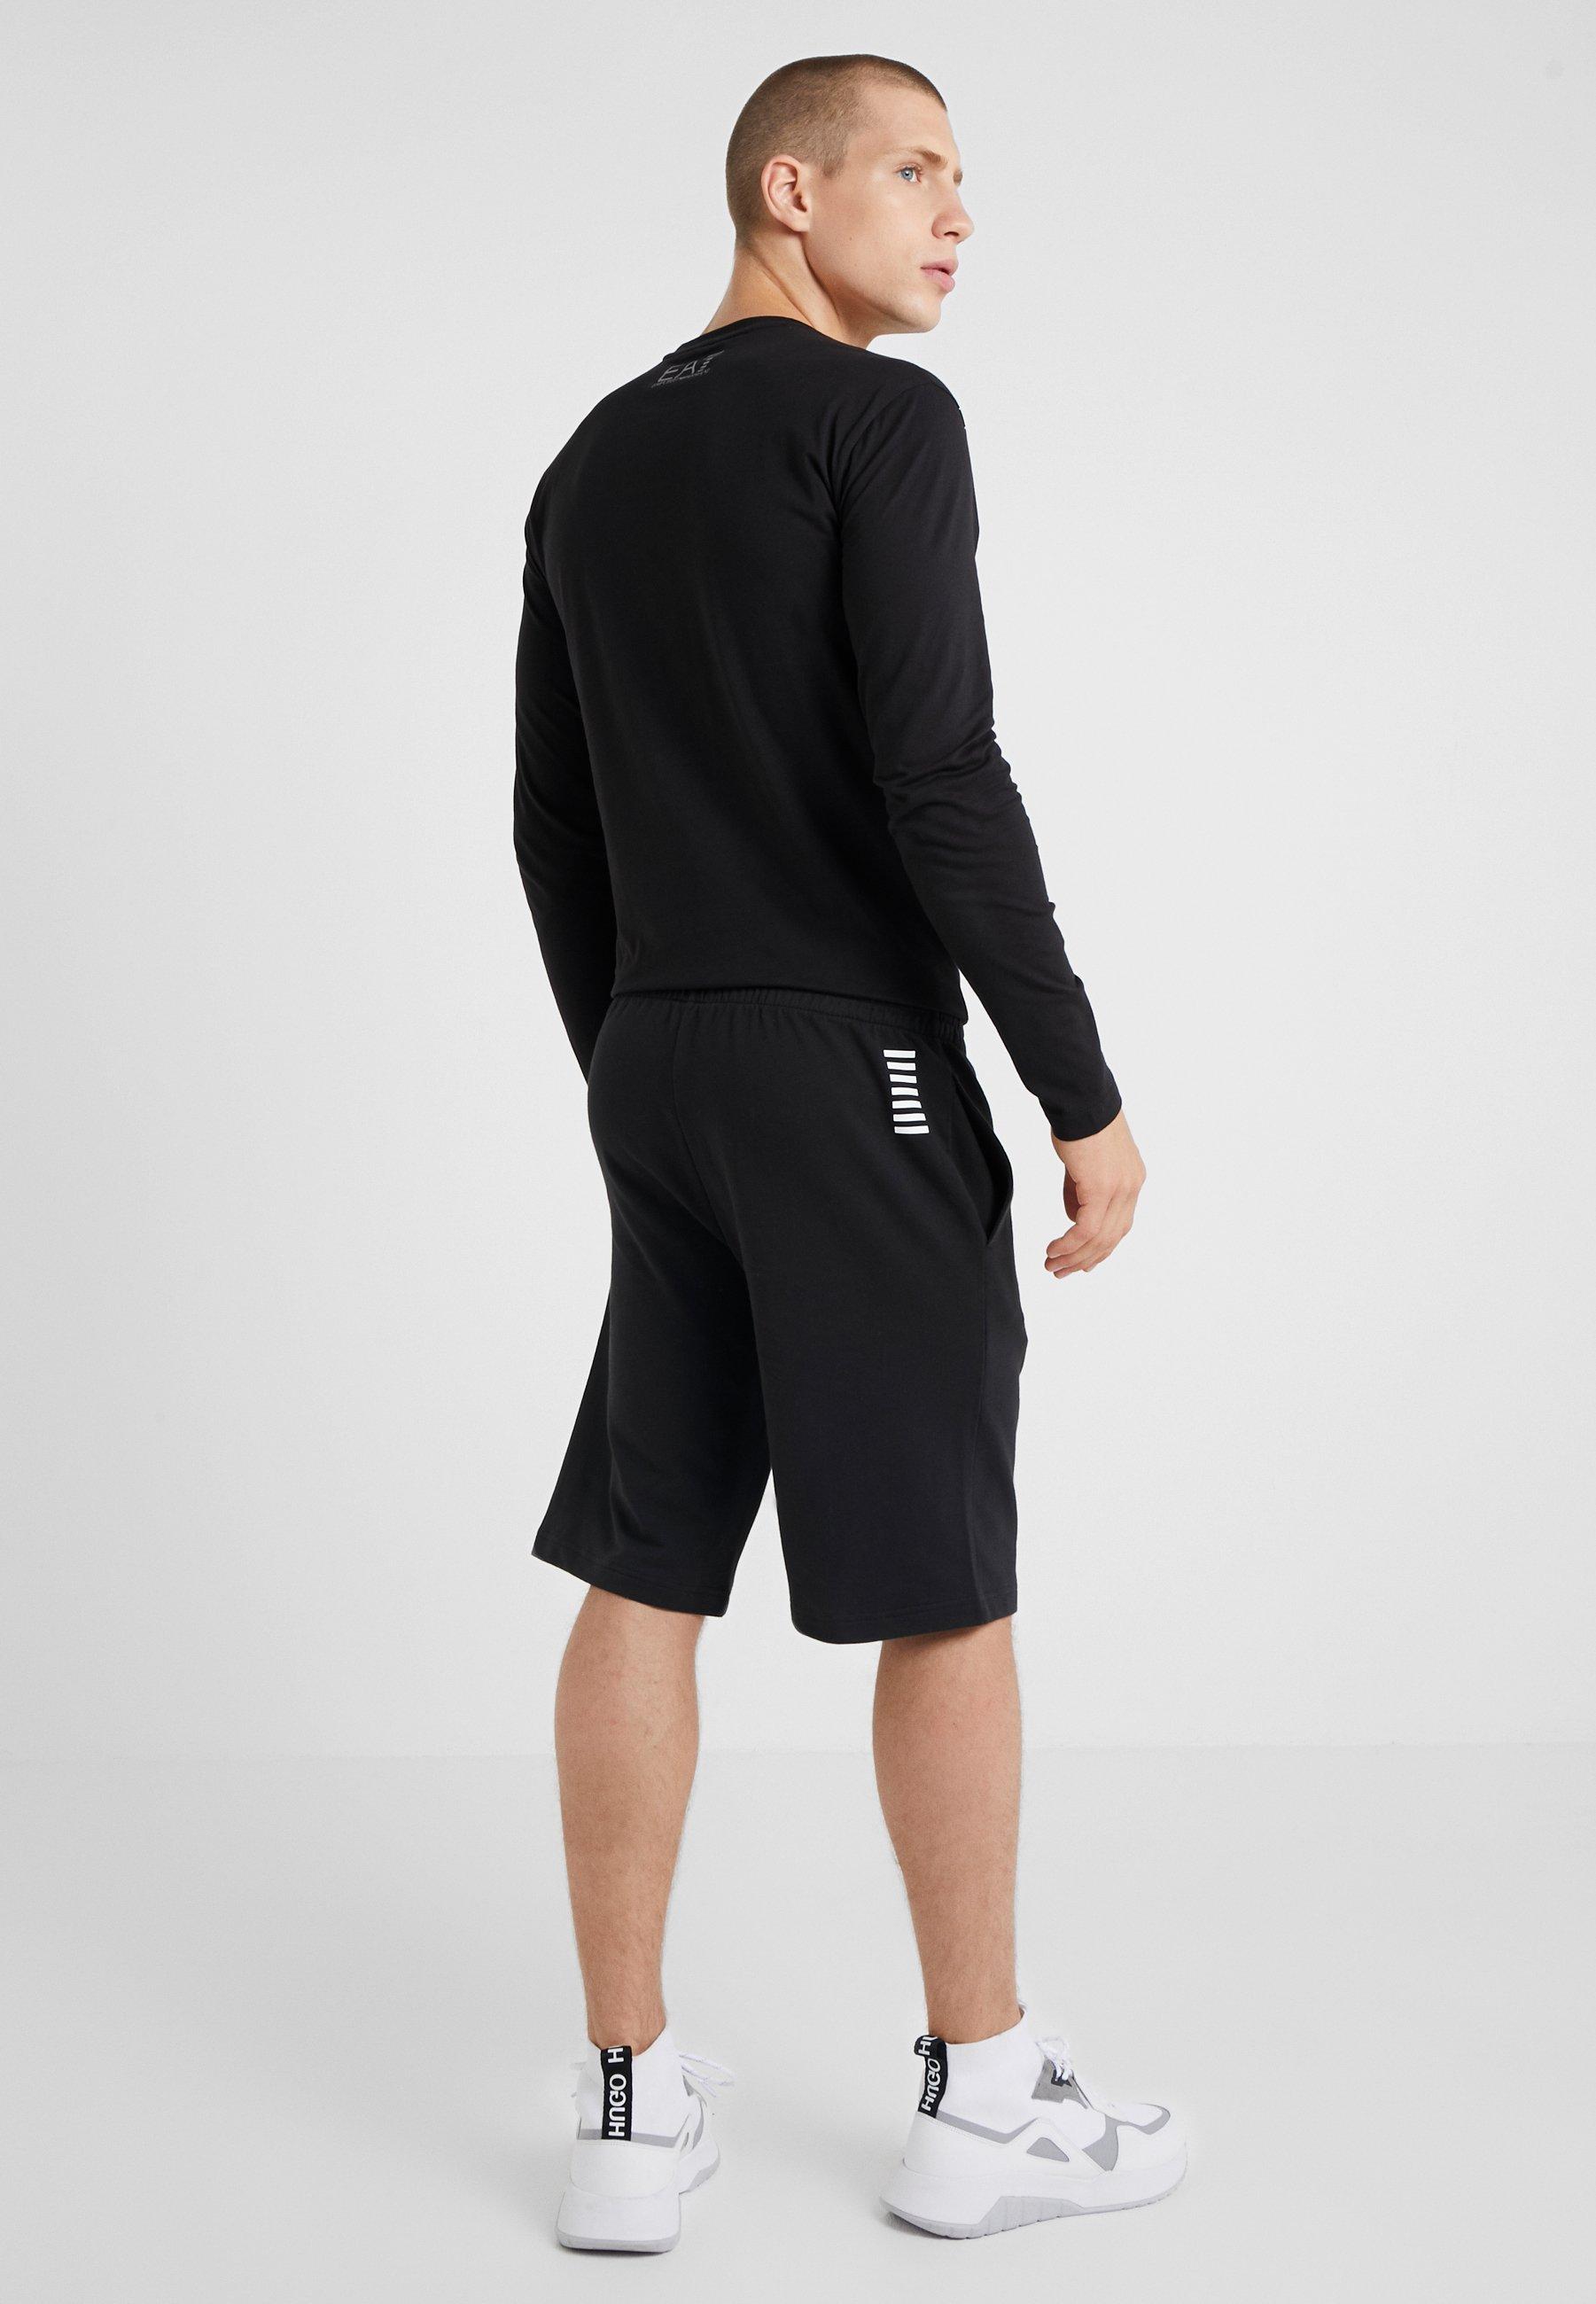 Ea7 De Armani Black Survêtement Emporio BermudaPantalon 8OkXPn0wN